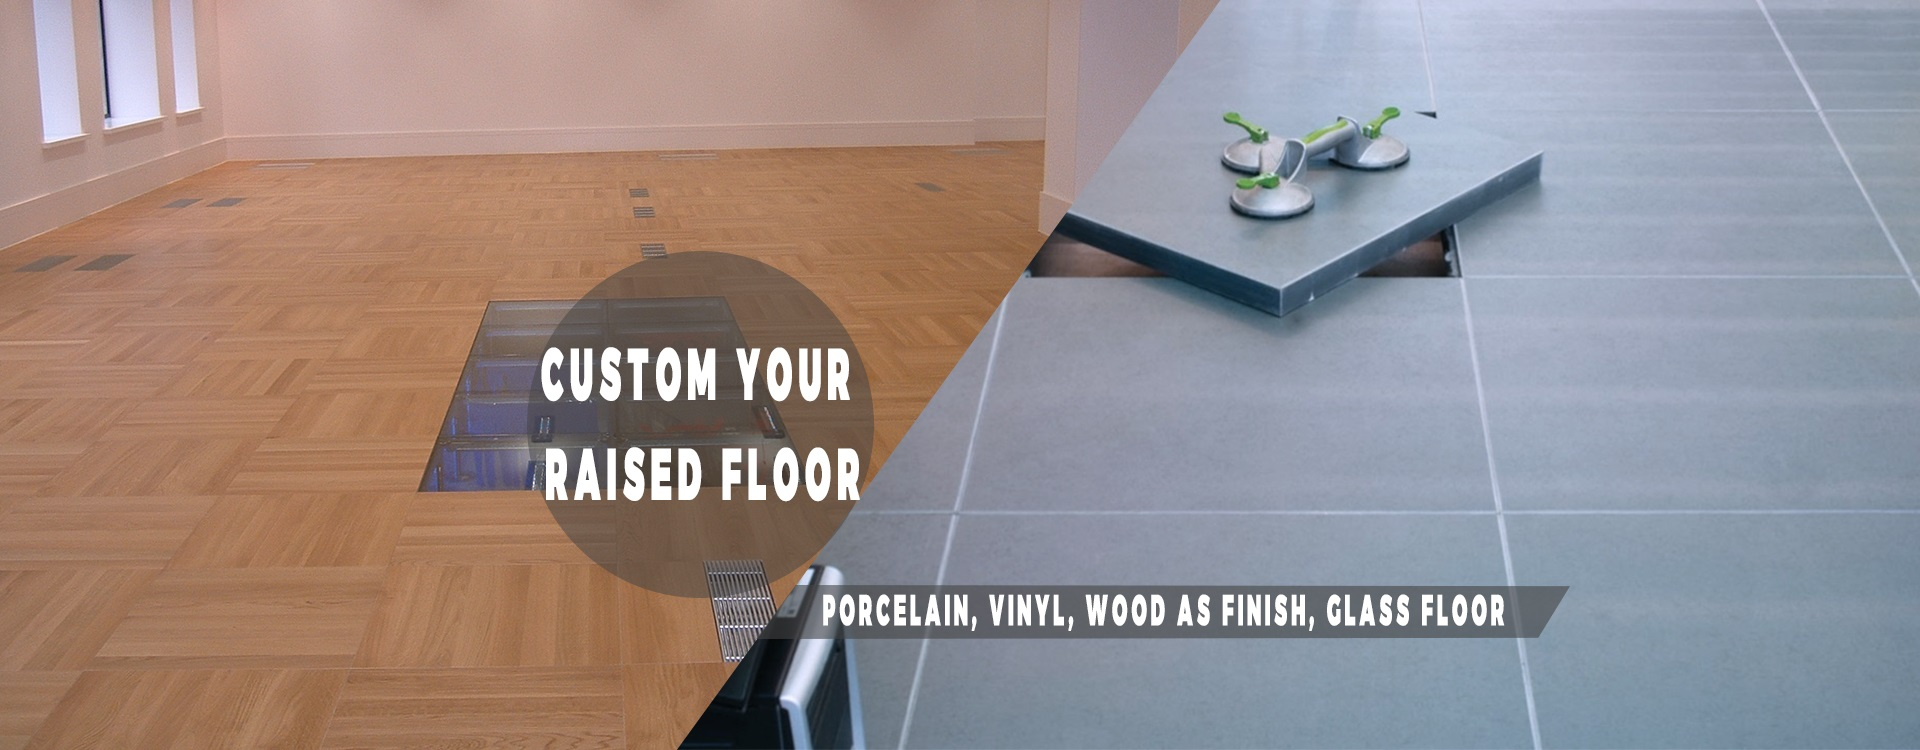 custom your raised floor